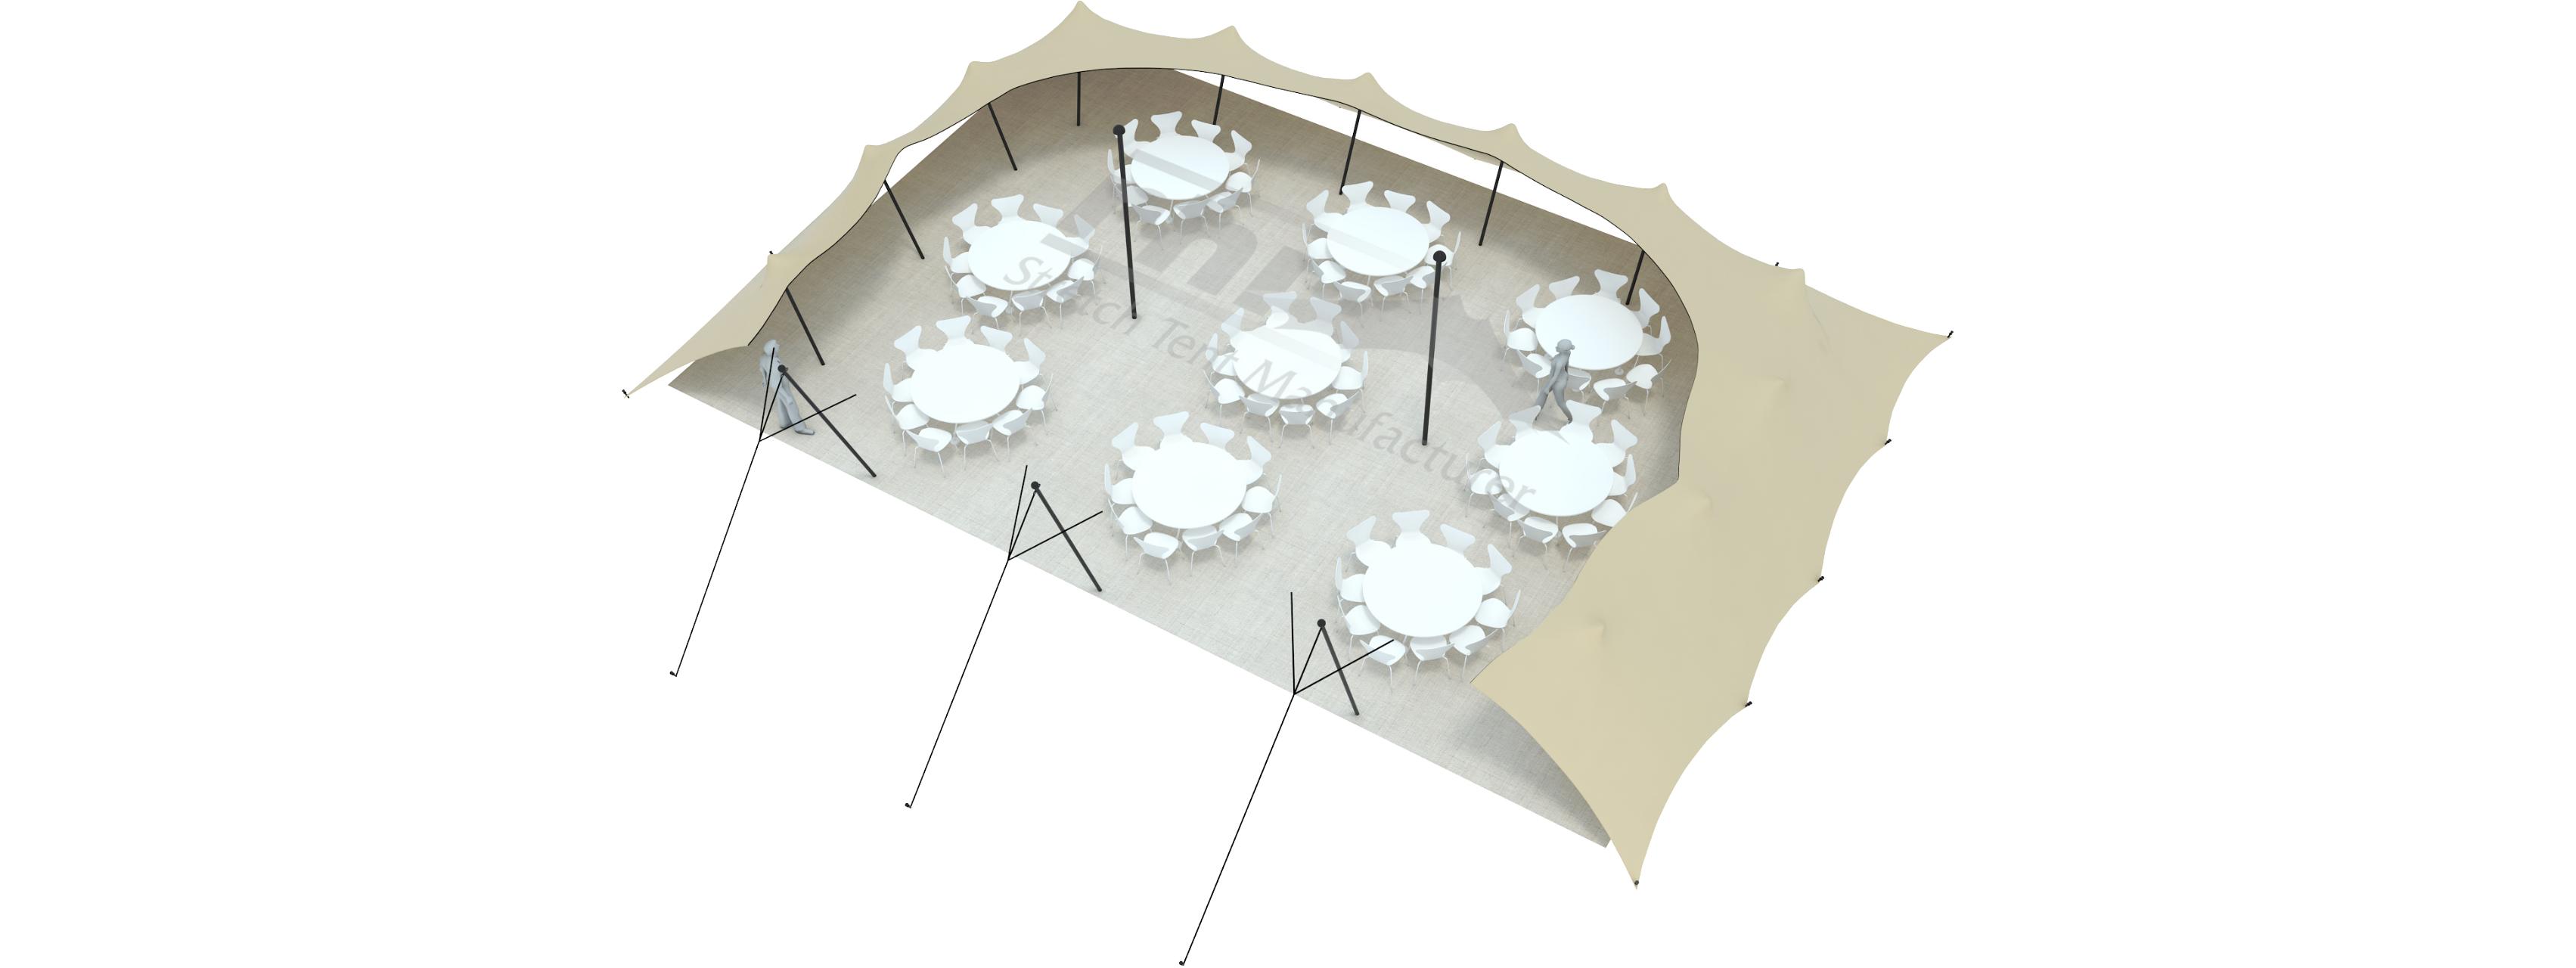 Aménagement-Table-Ronde